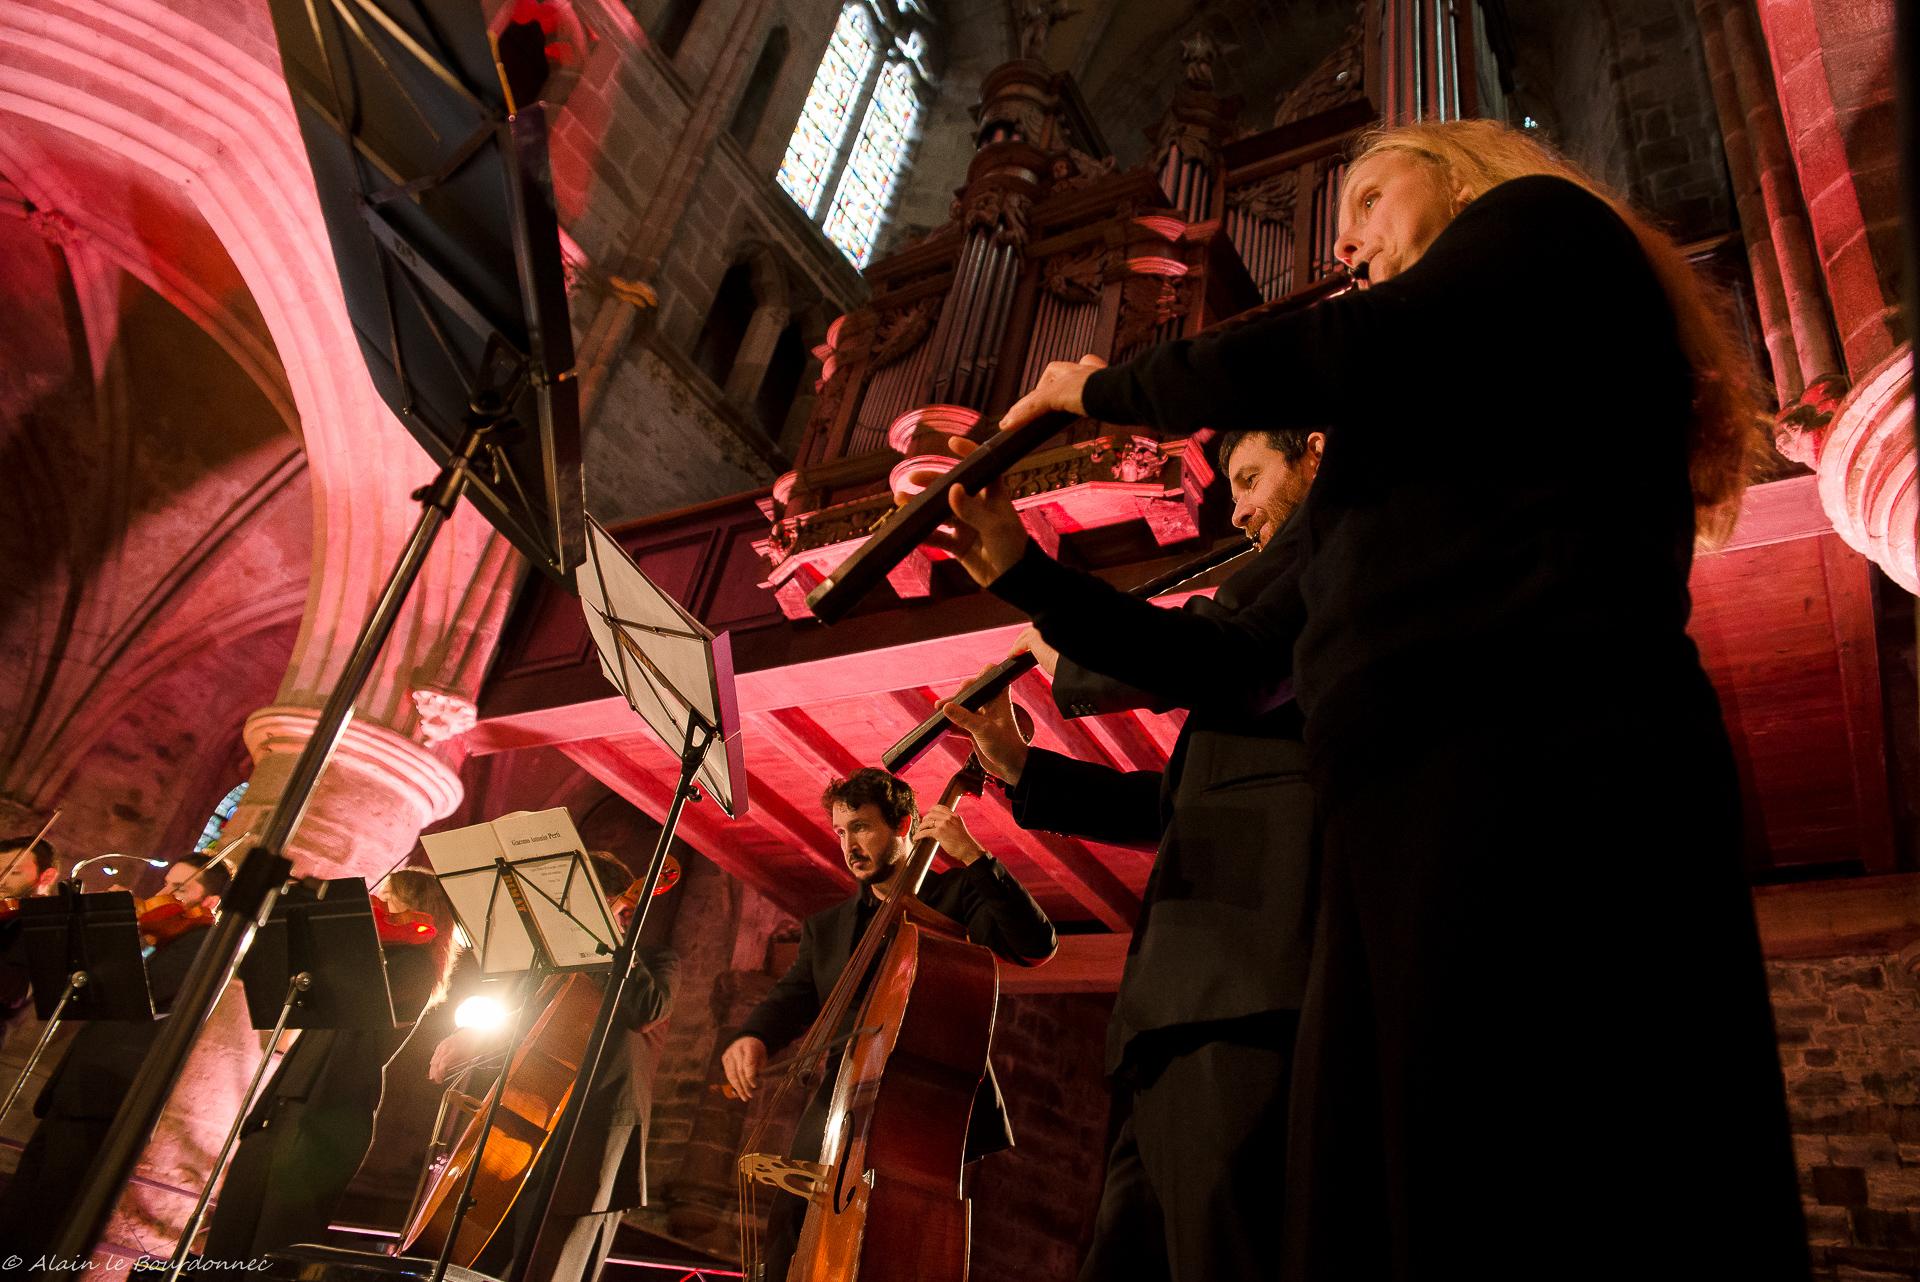 Concert de Clôture, Concerto soave